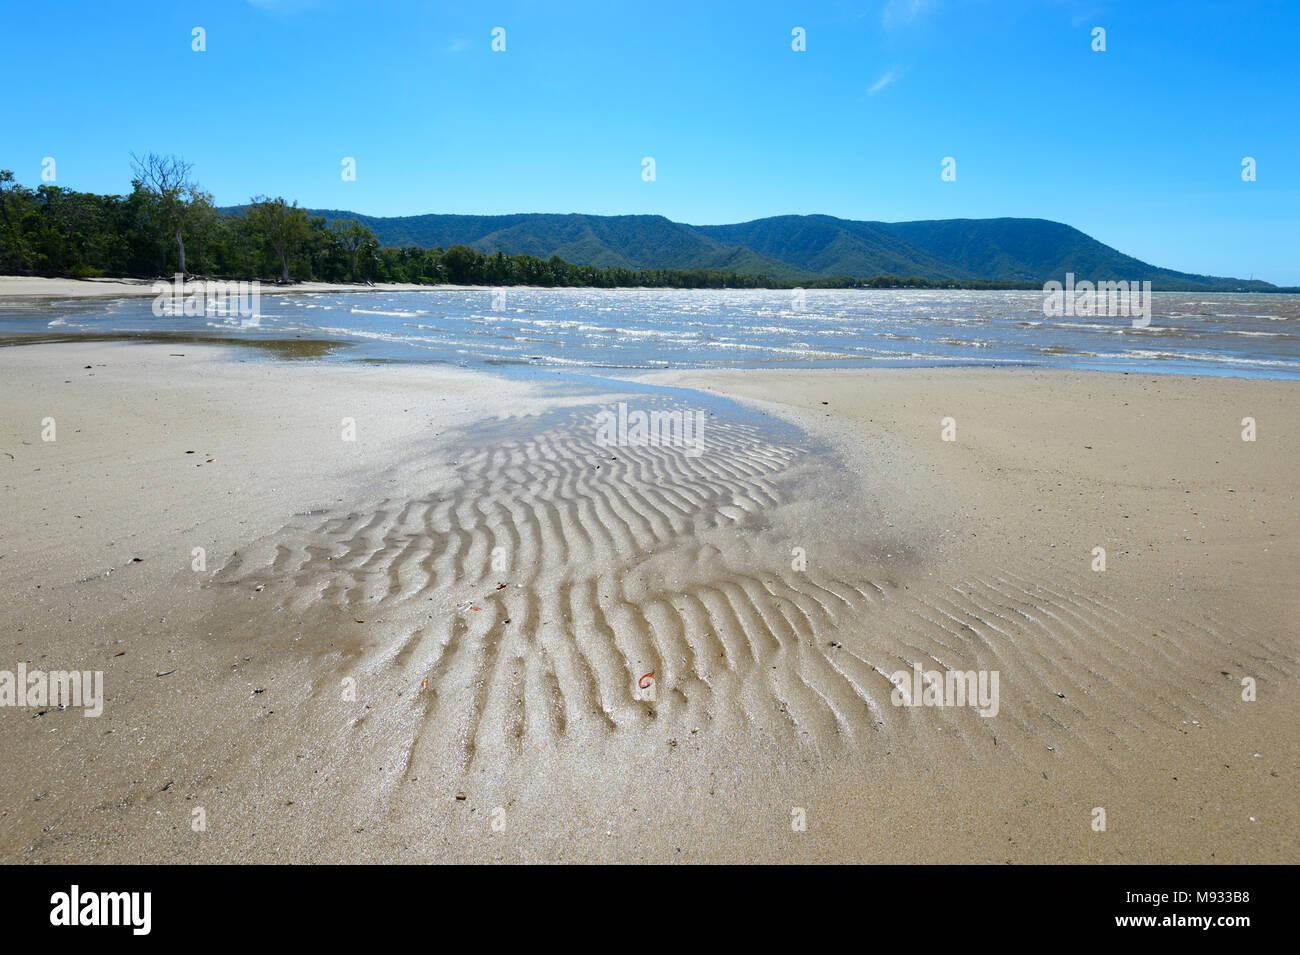 Modelli di sabbia a Kewarra Beach, Cairns Northern Beaches, estremo Nord Queensland, FNQ, QLD, Australia Immagini Stock